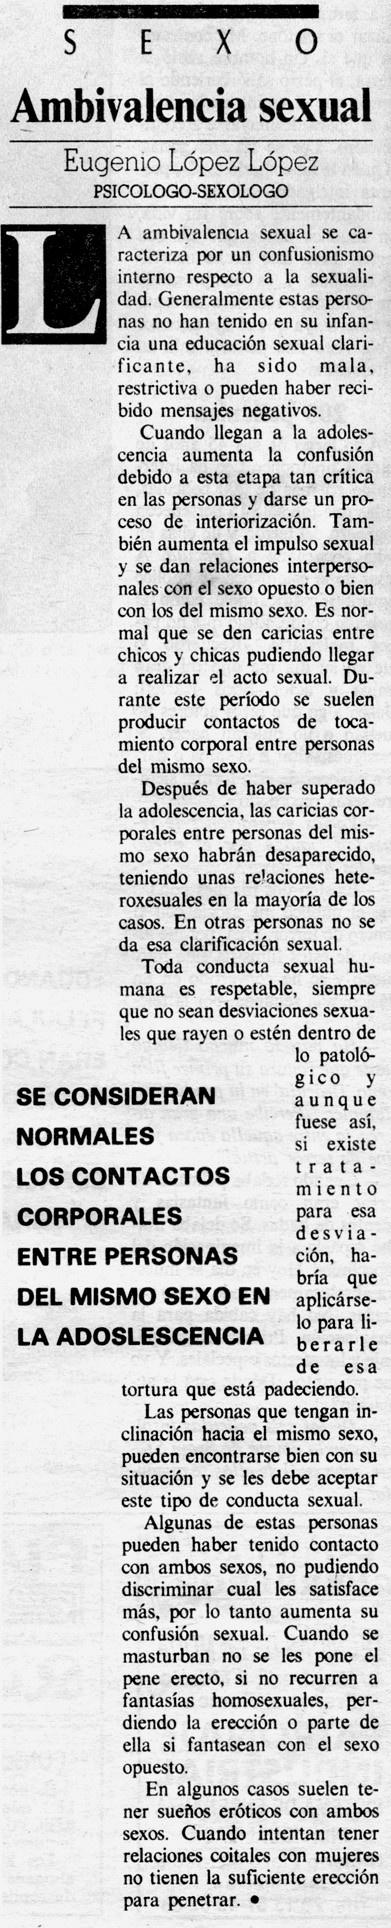 1991-06-30-p